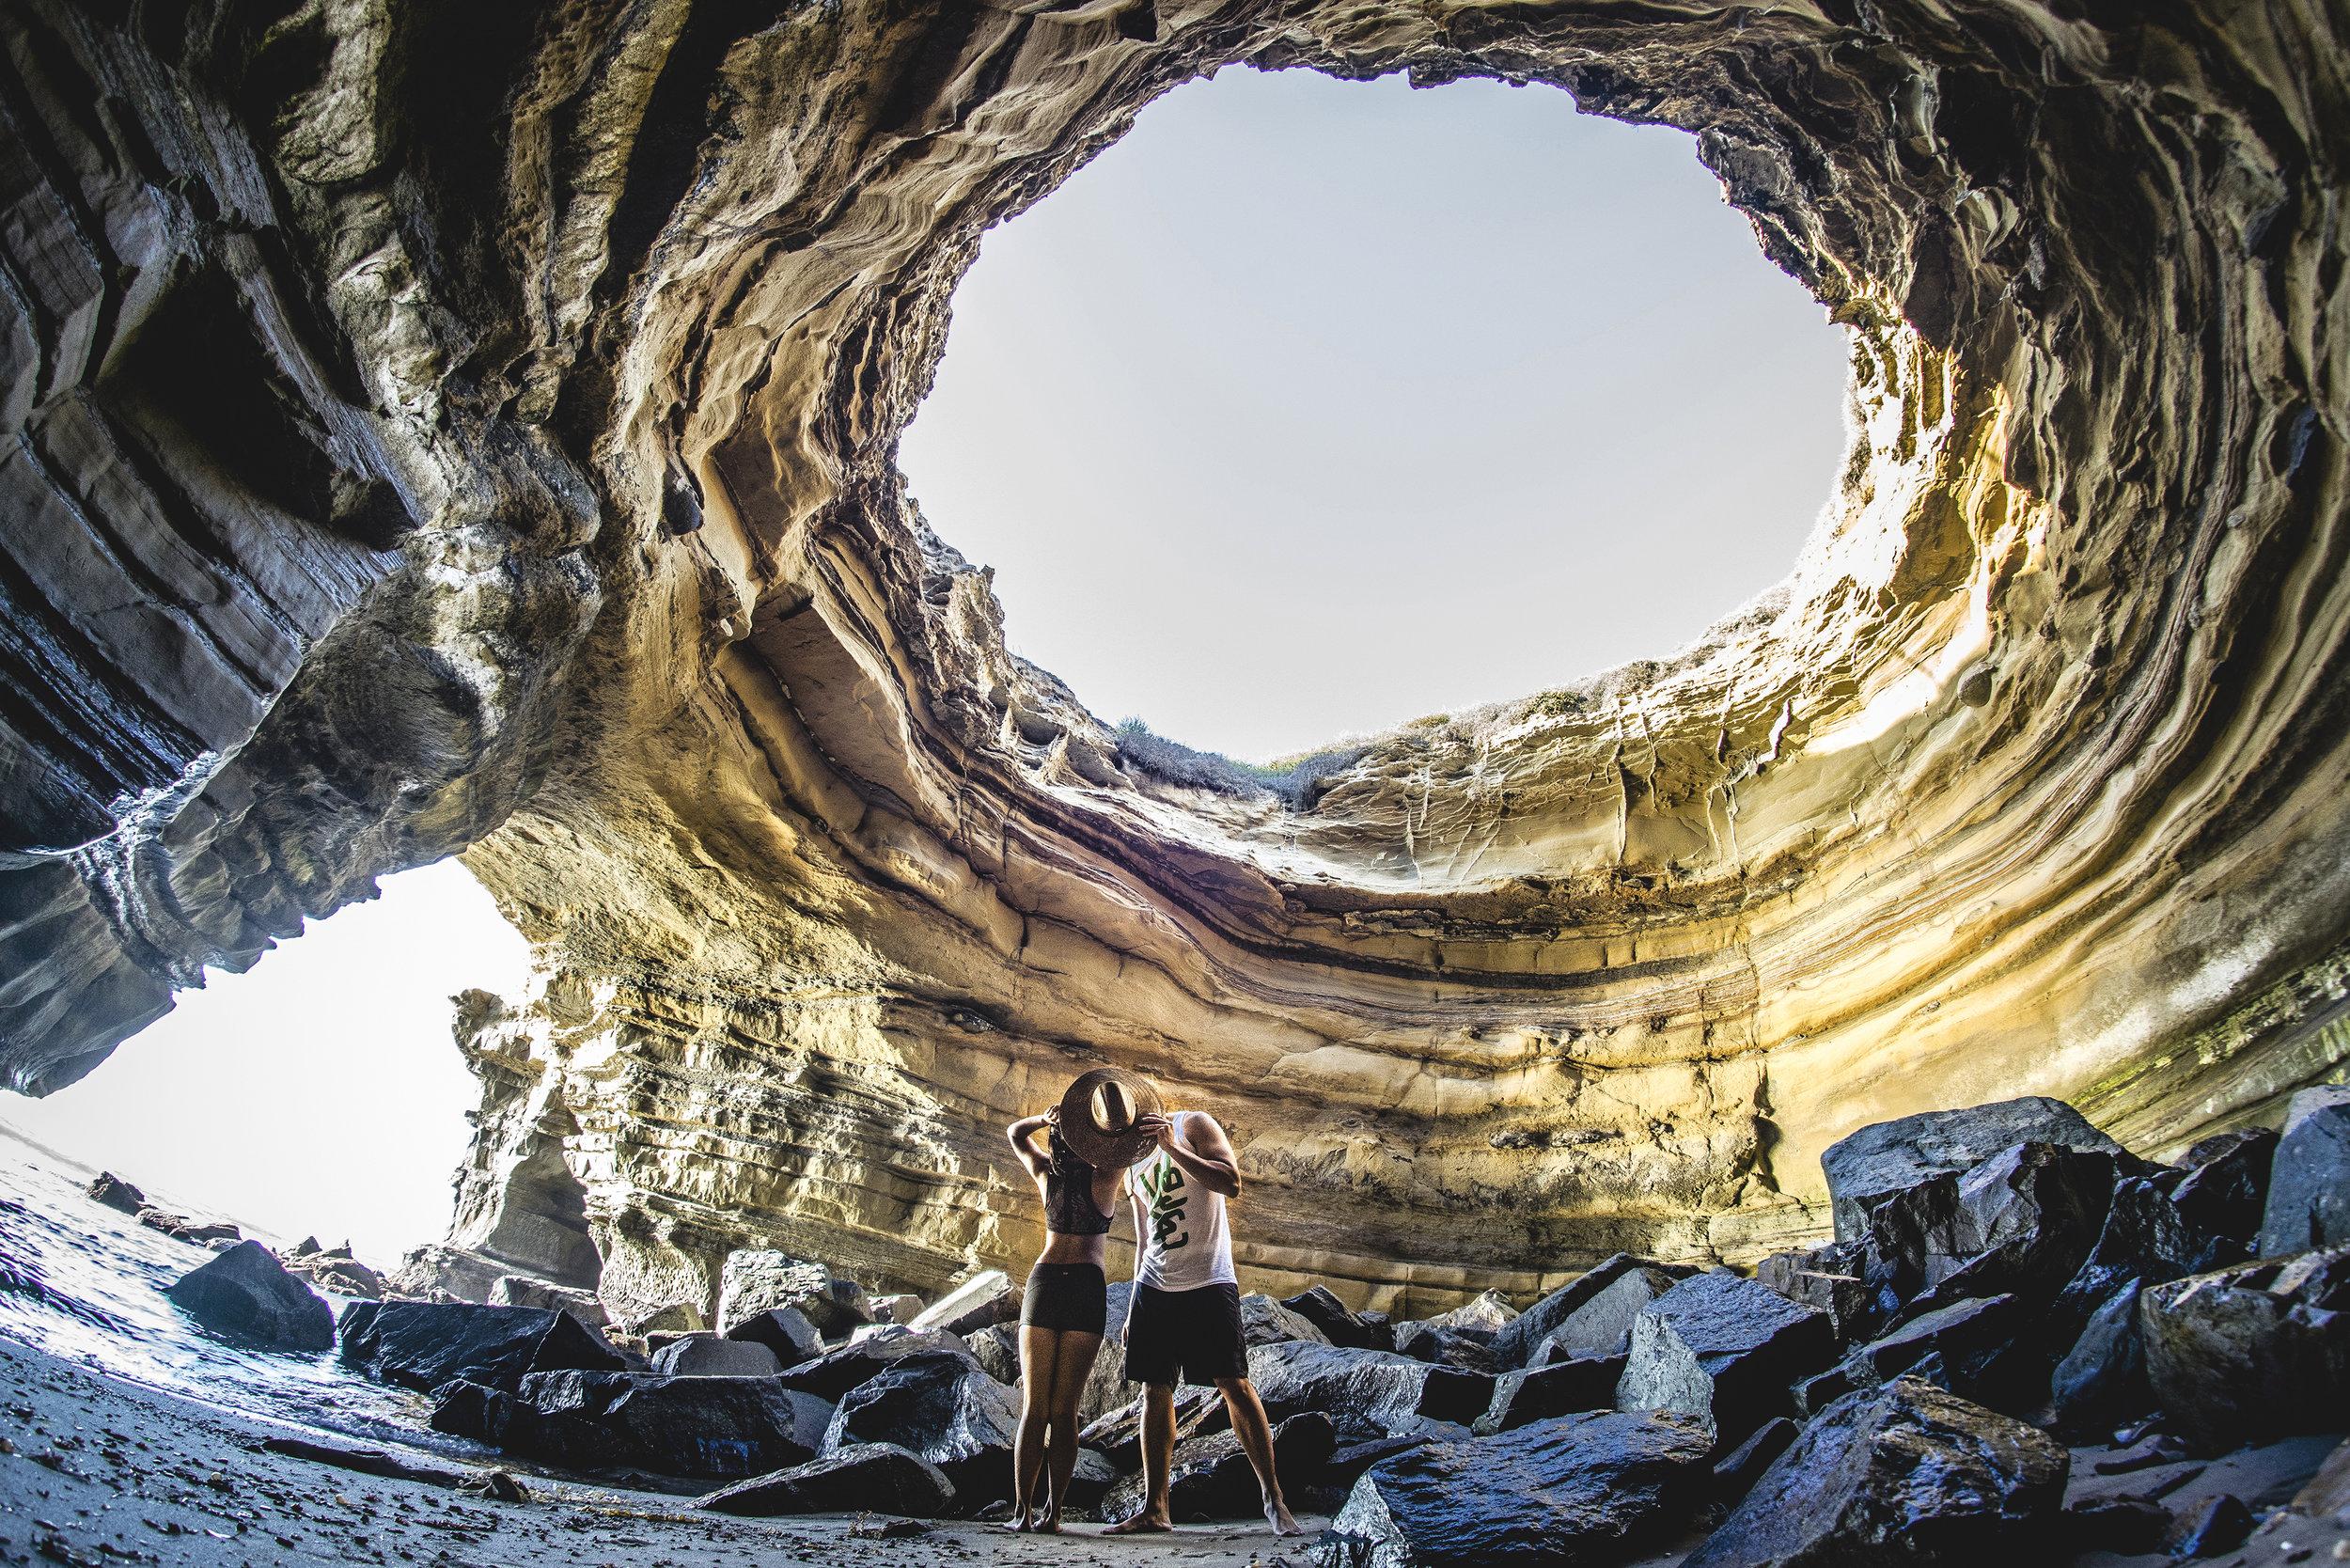 Rles Sunset Cliffs Secret Caves (09.30.2015)_22.1 50%.jpg